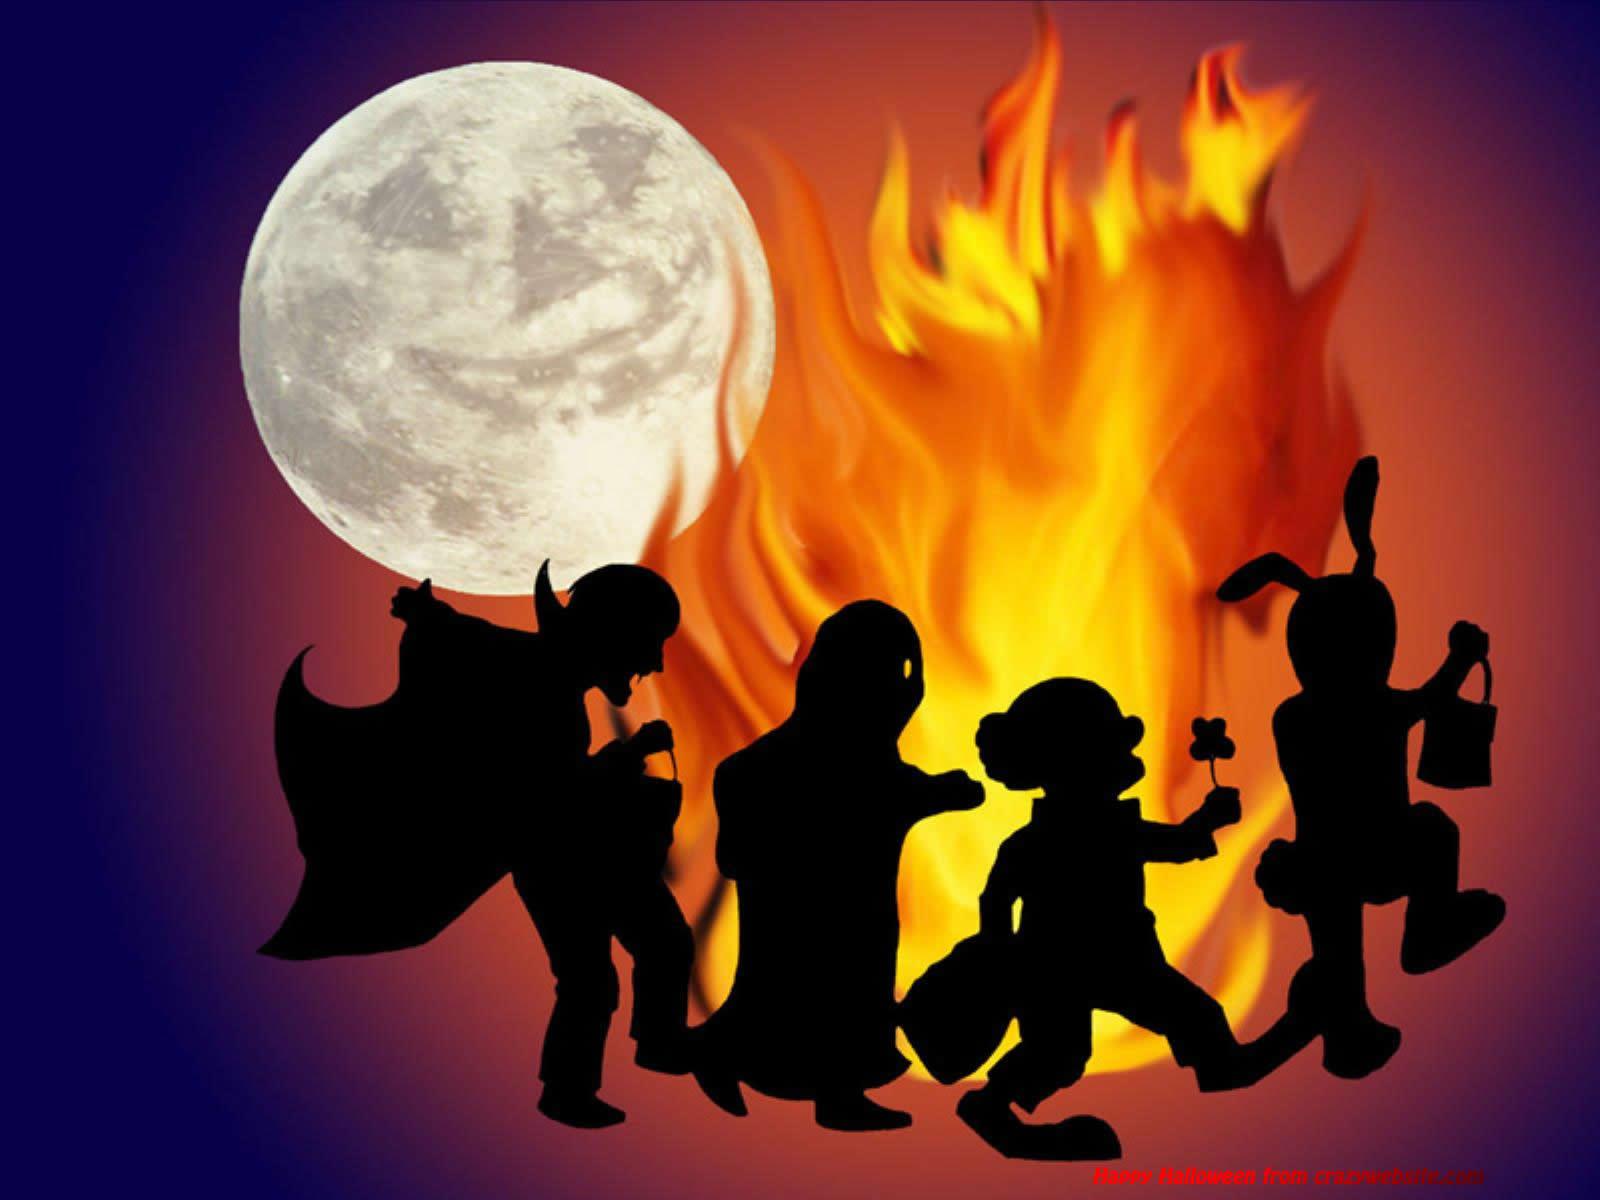 Horror clipart kids halloween #10